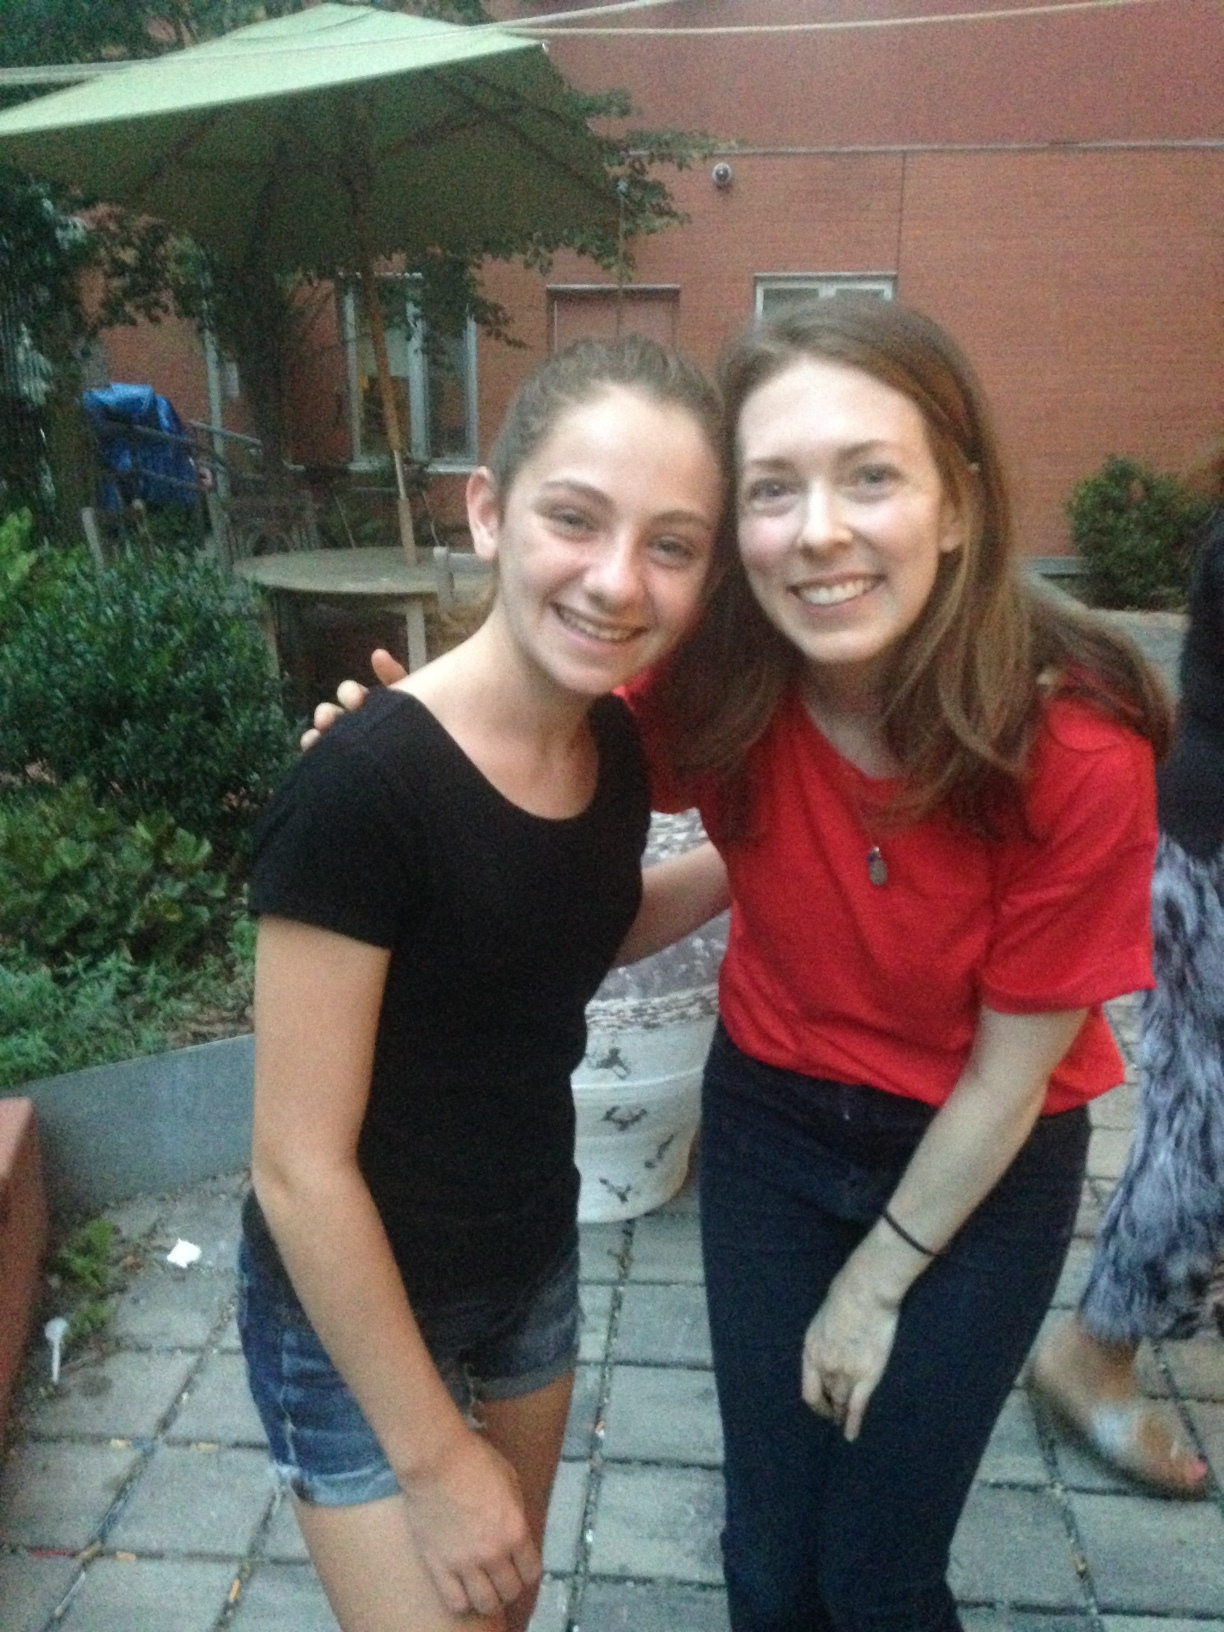 Julie and Erin!